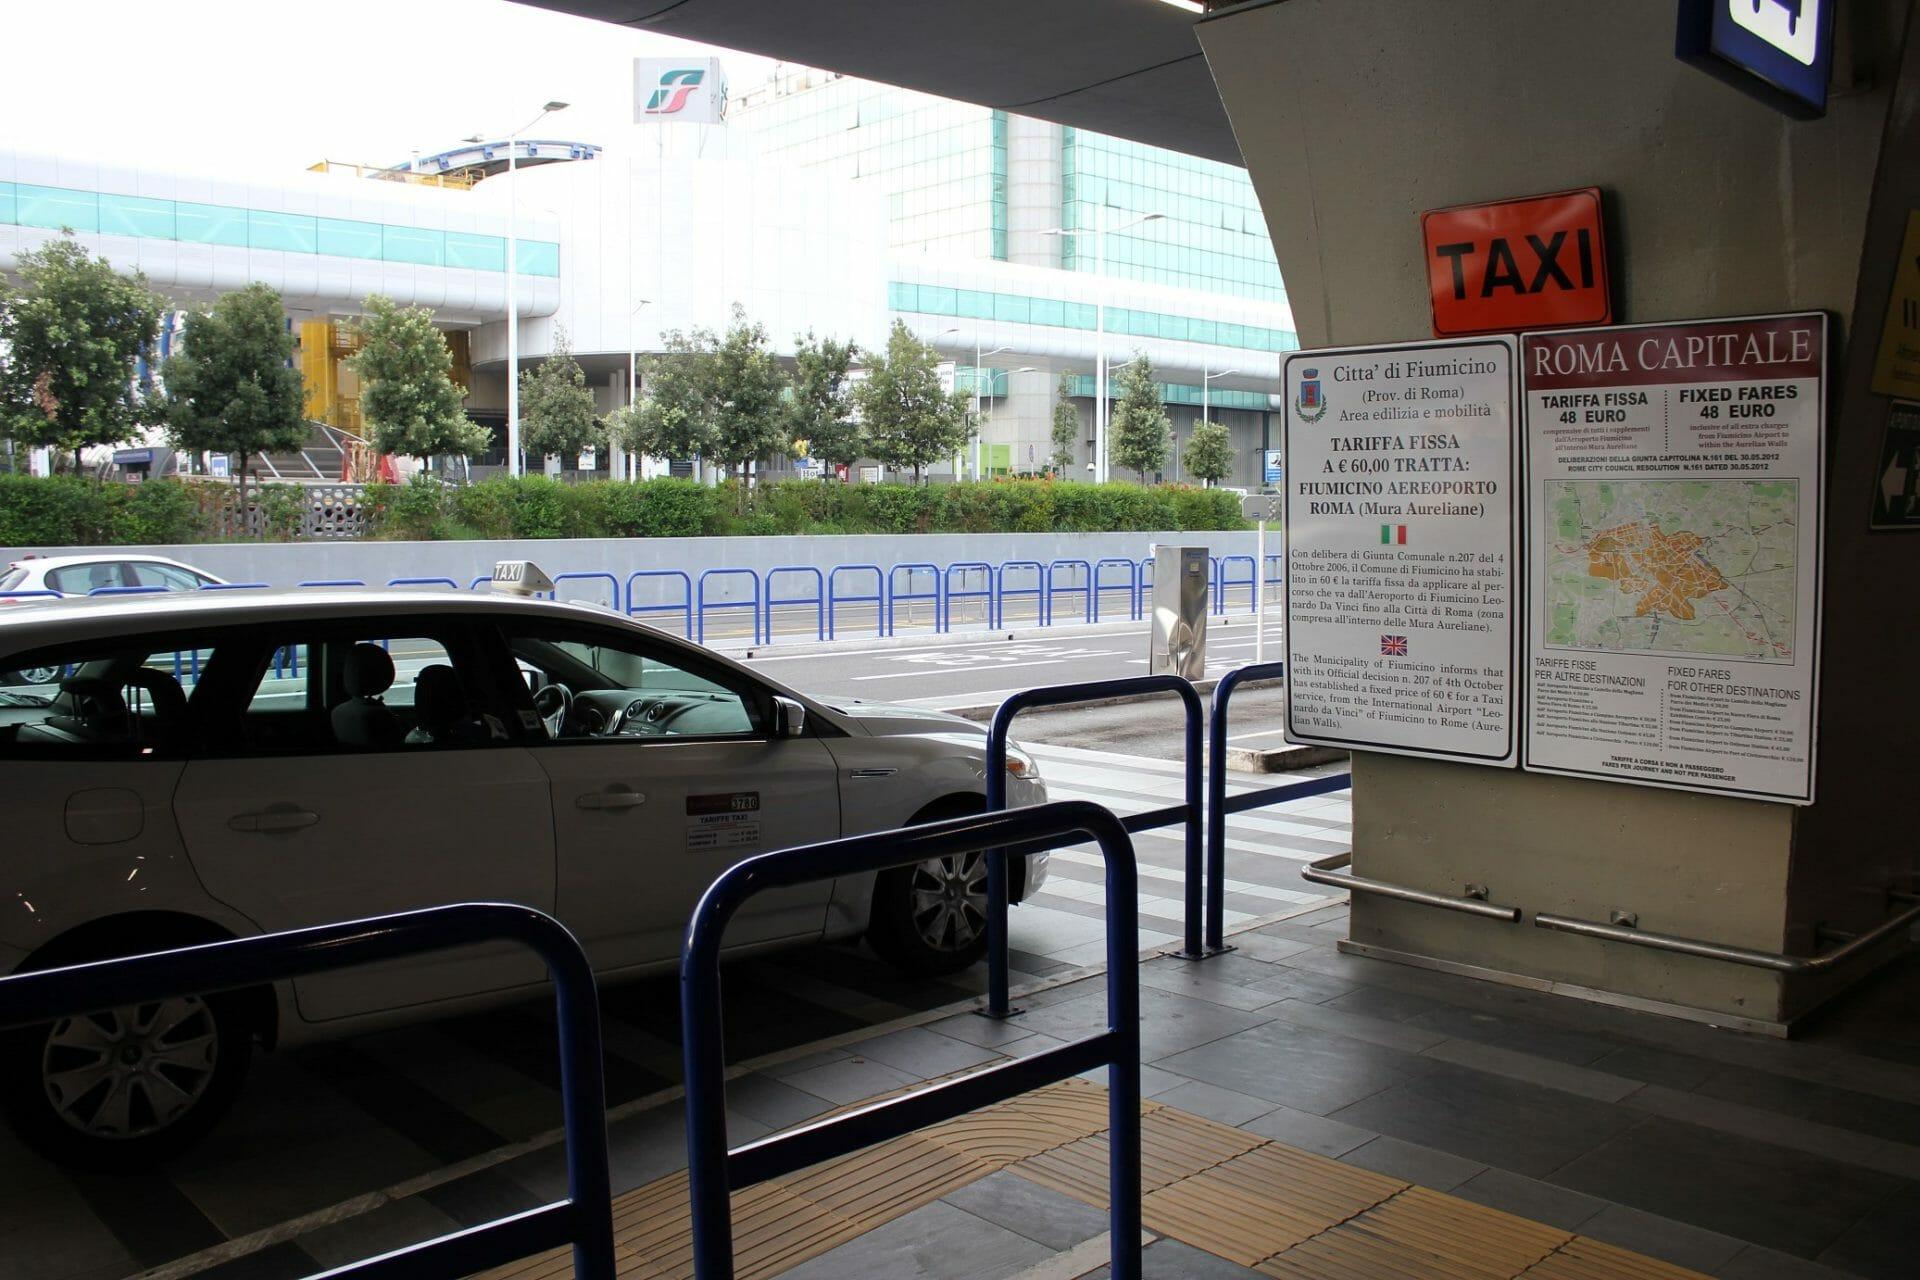 rome's public transport Taxi